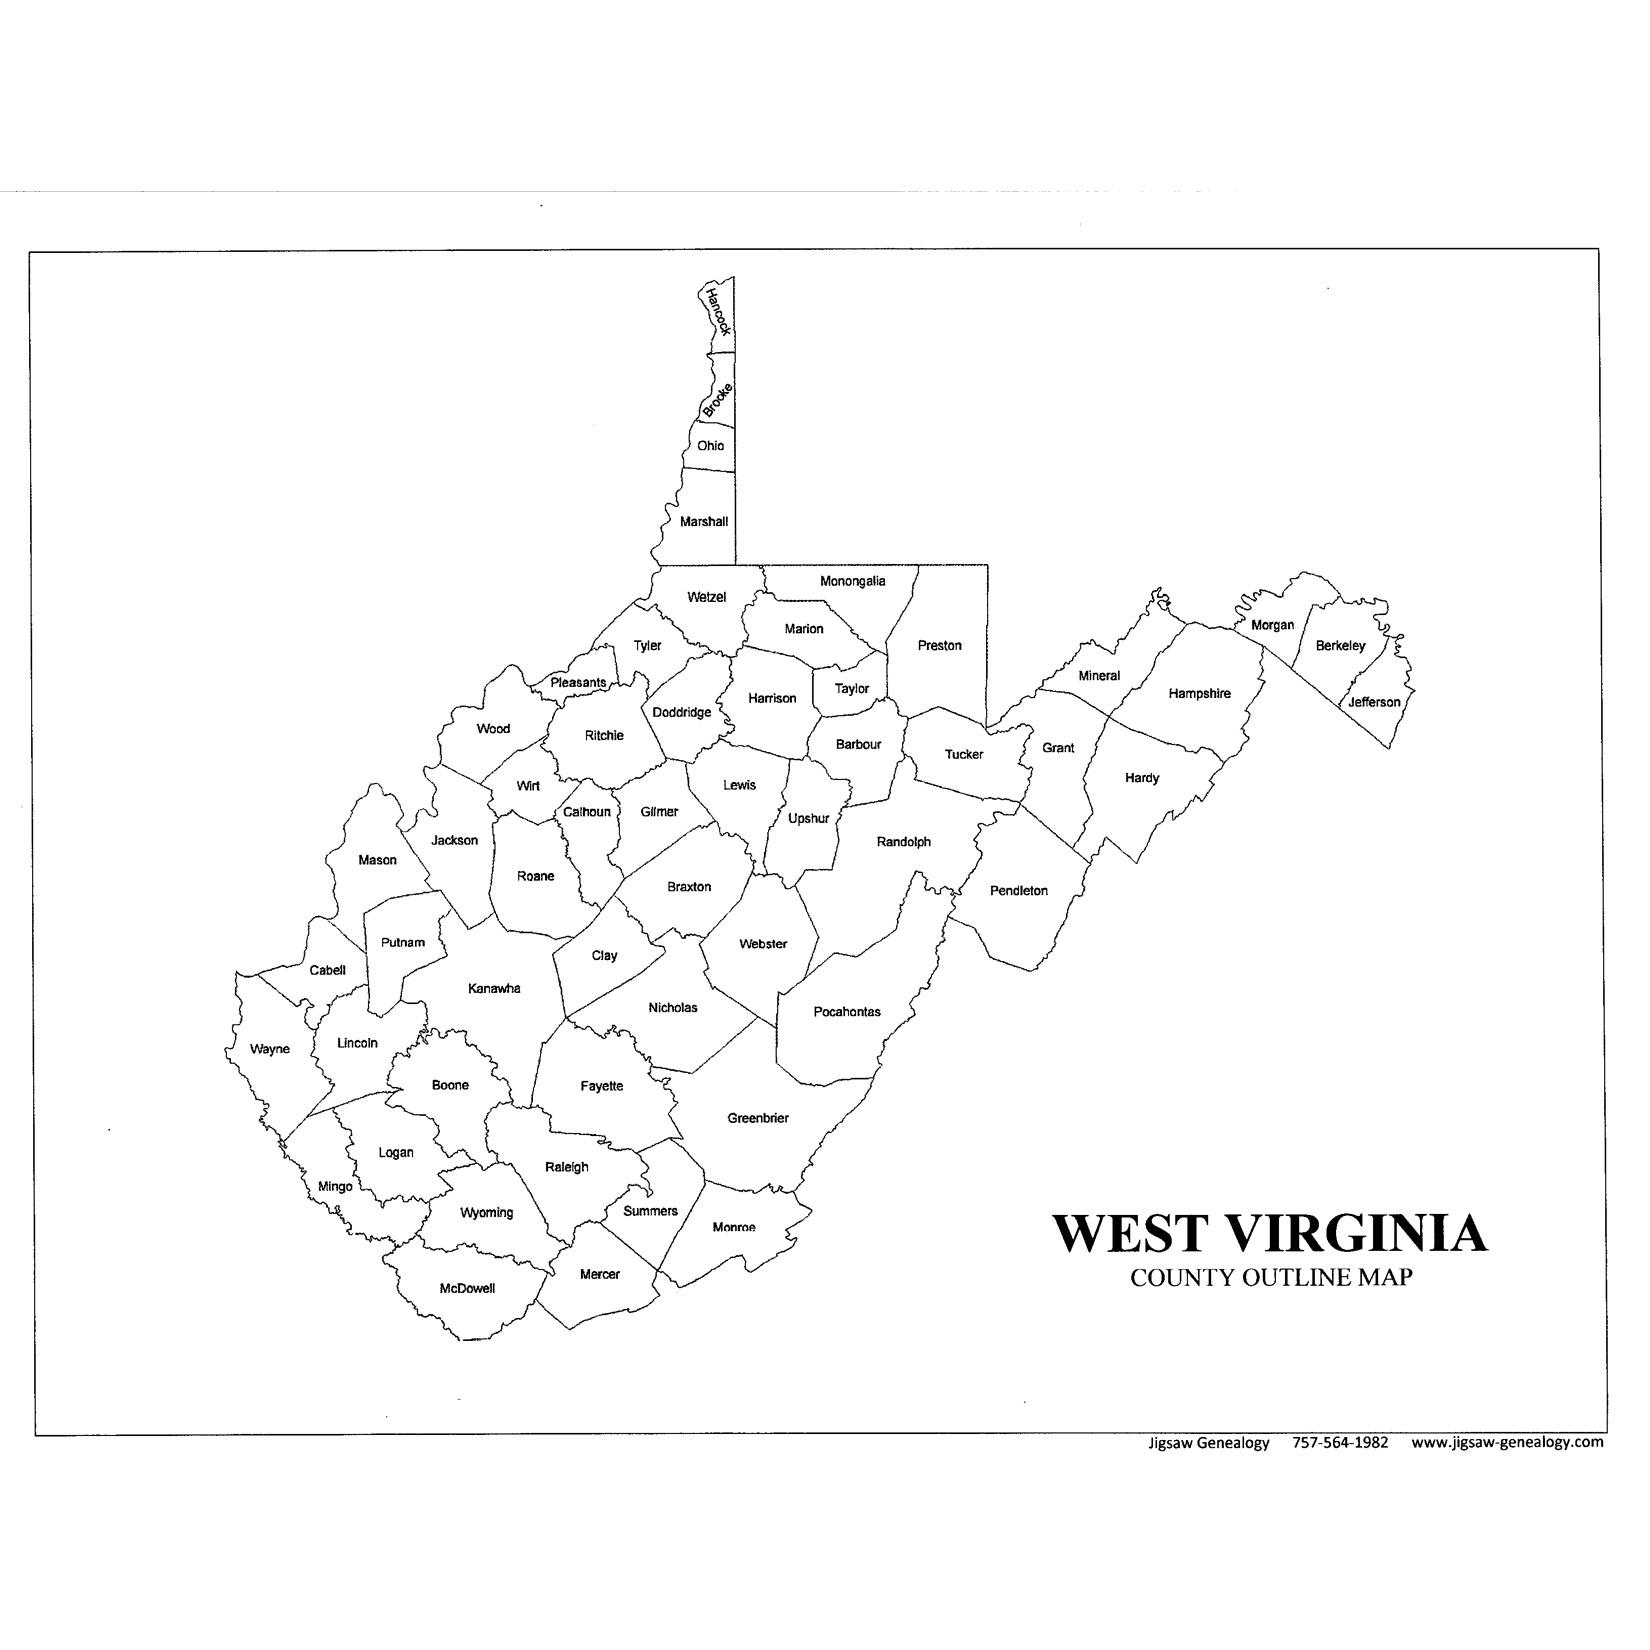 West Virginia County Map Jigsaw Genealogy